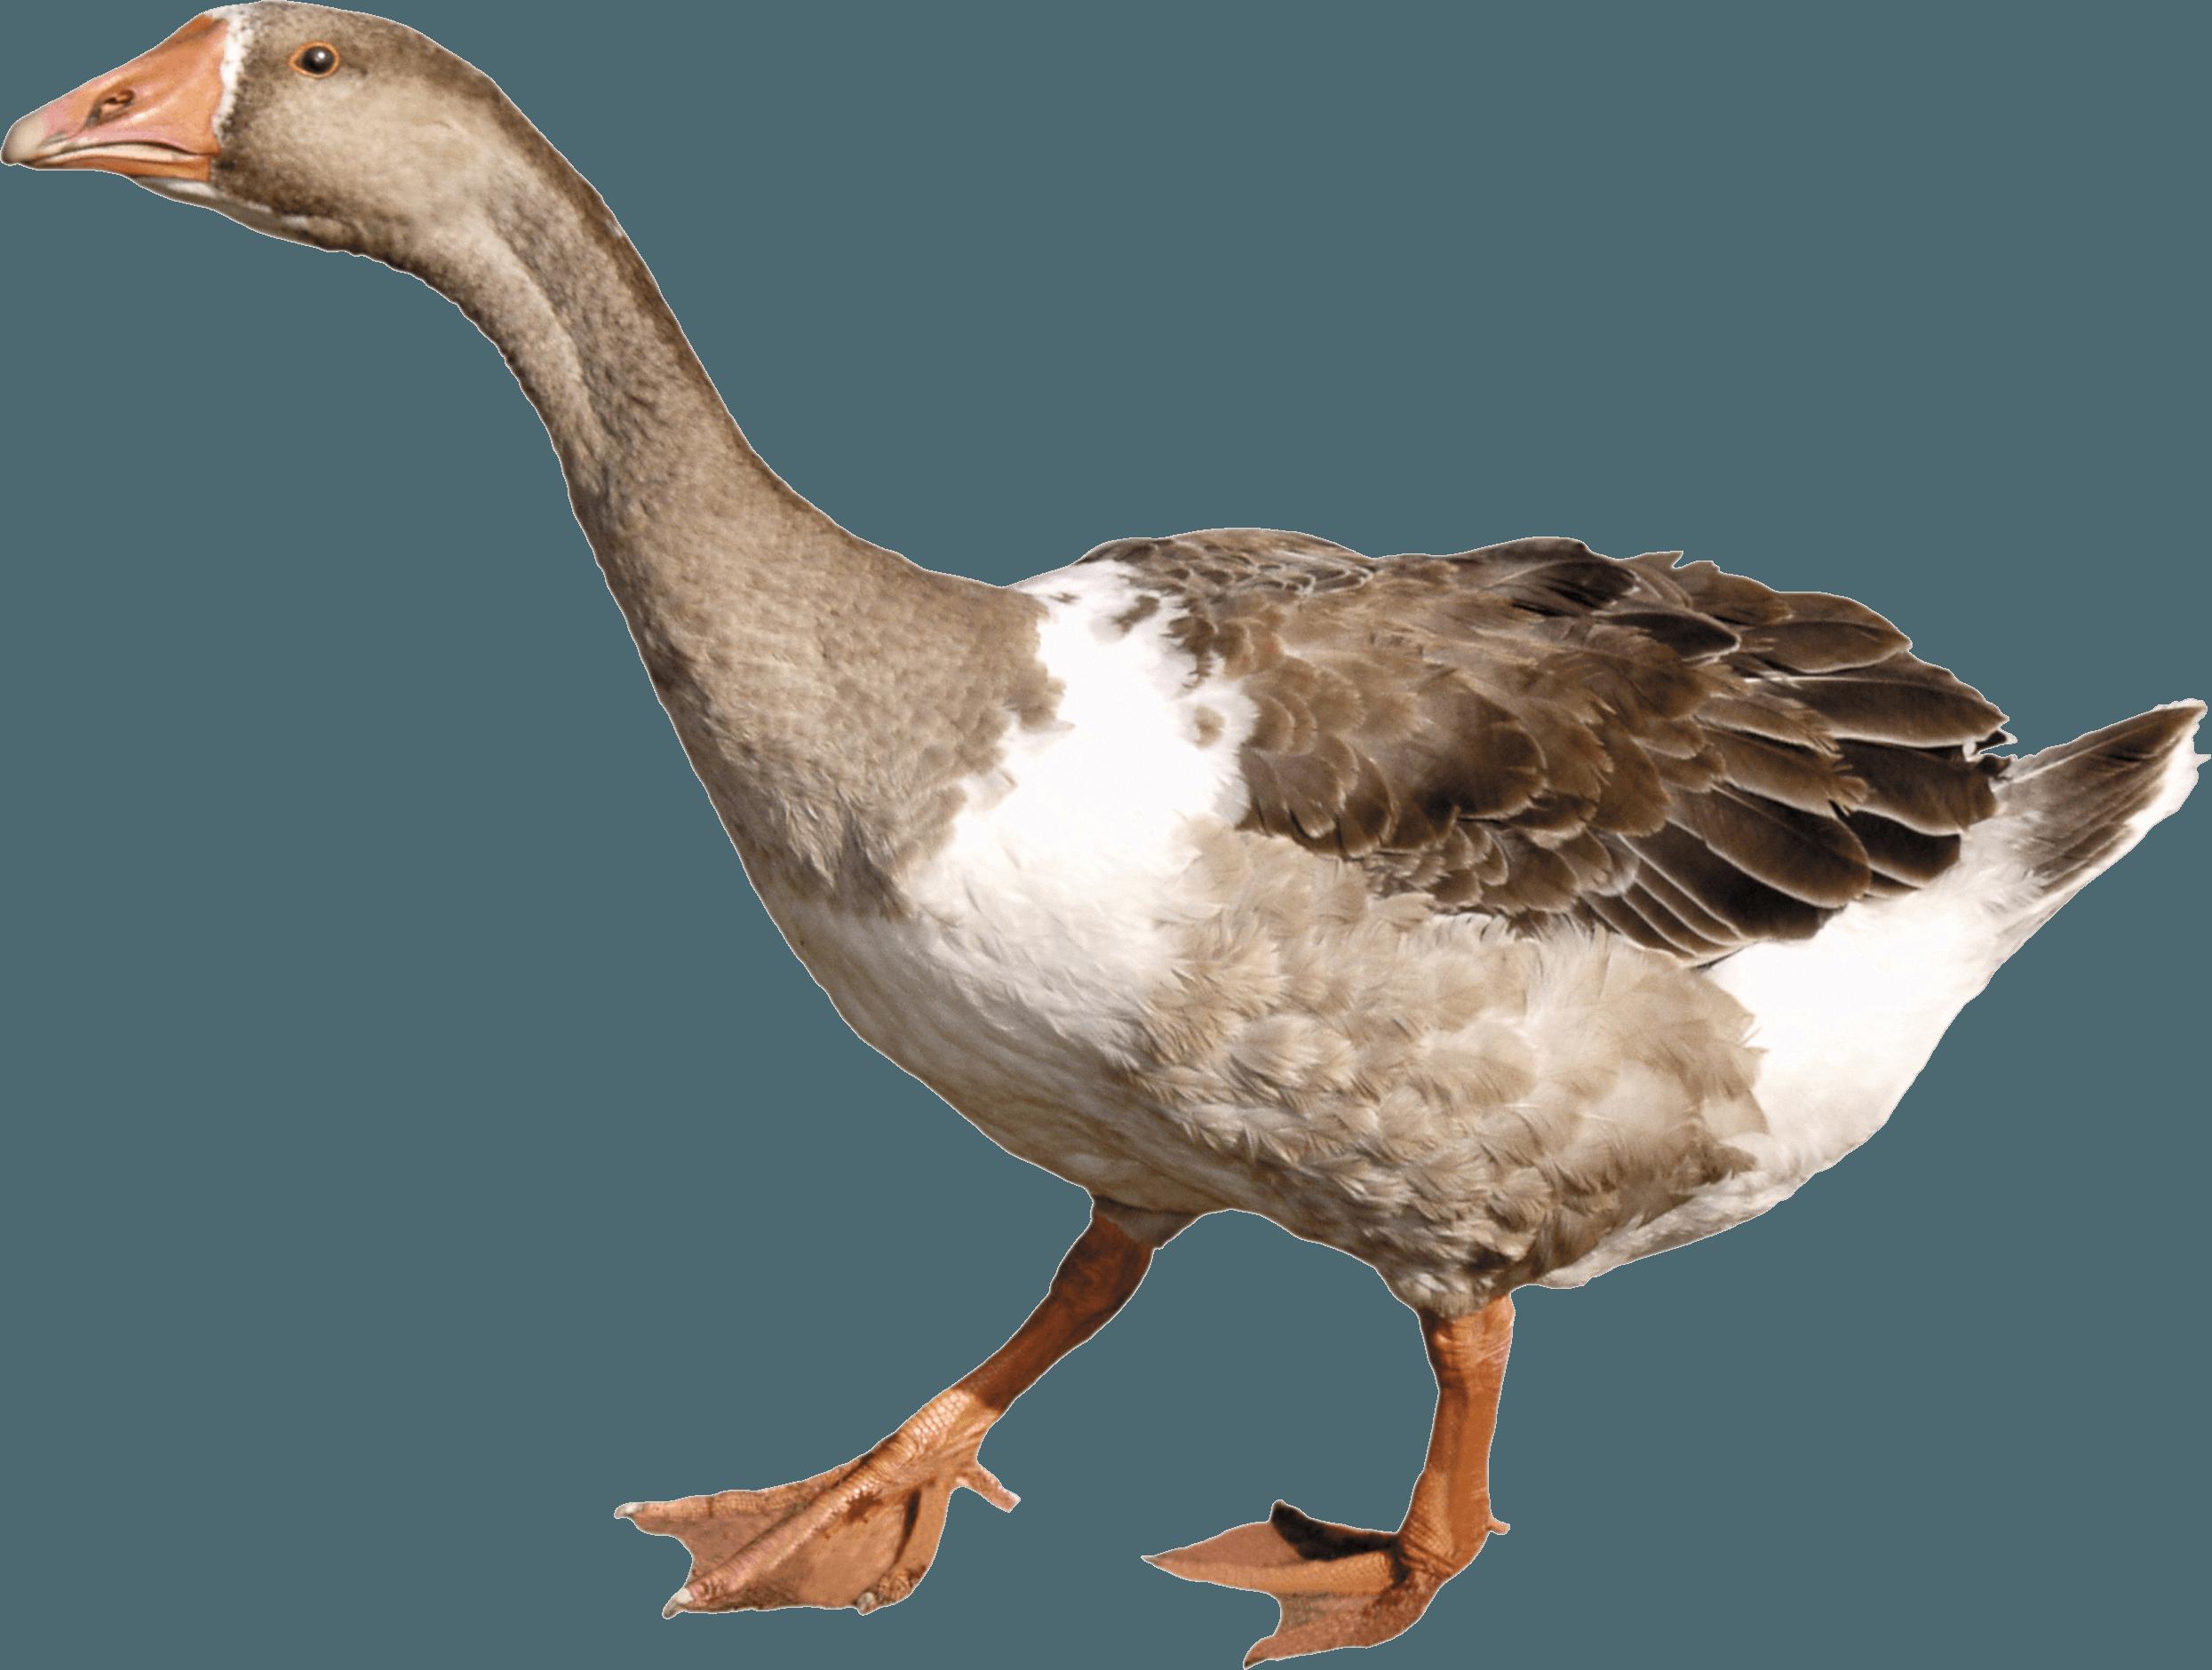 goose PNG Image.